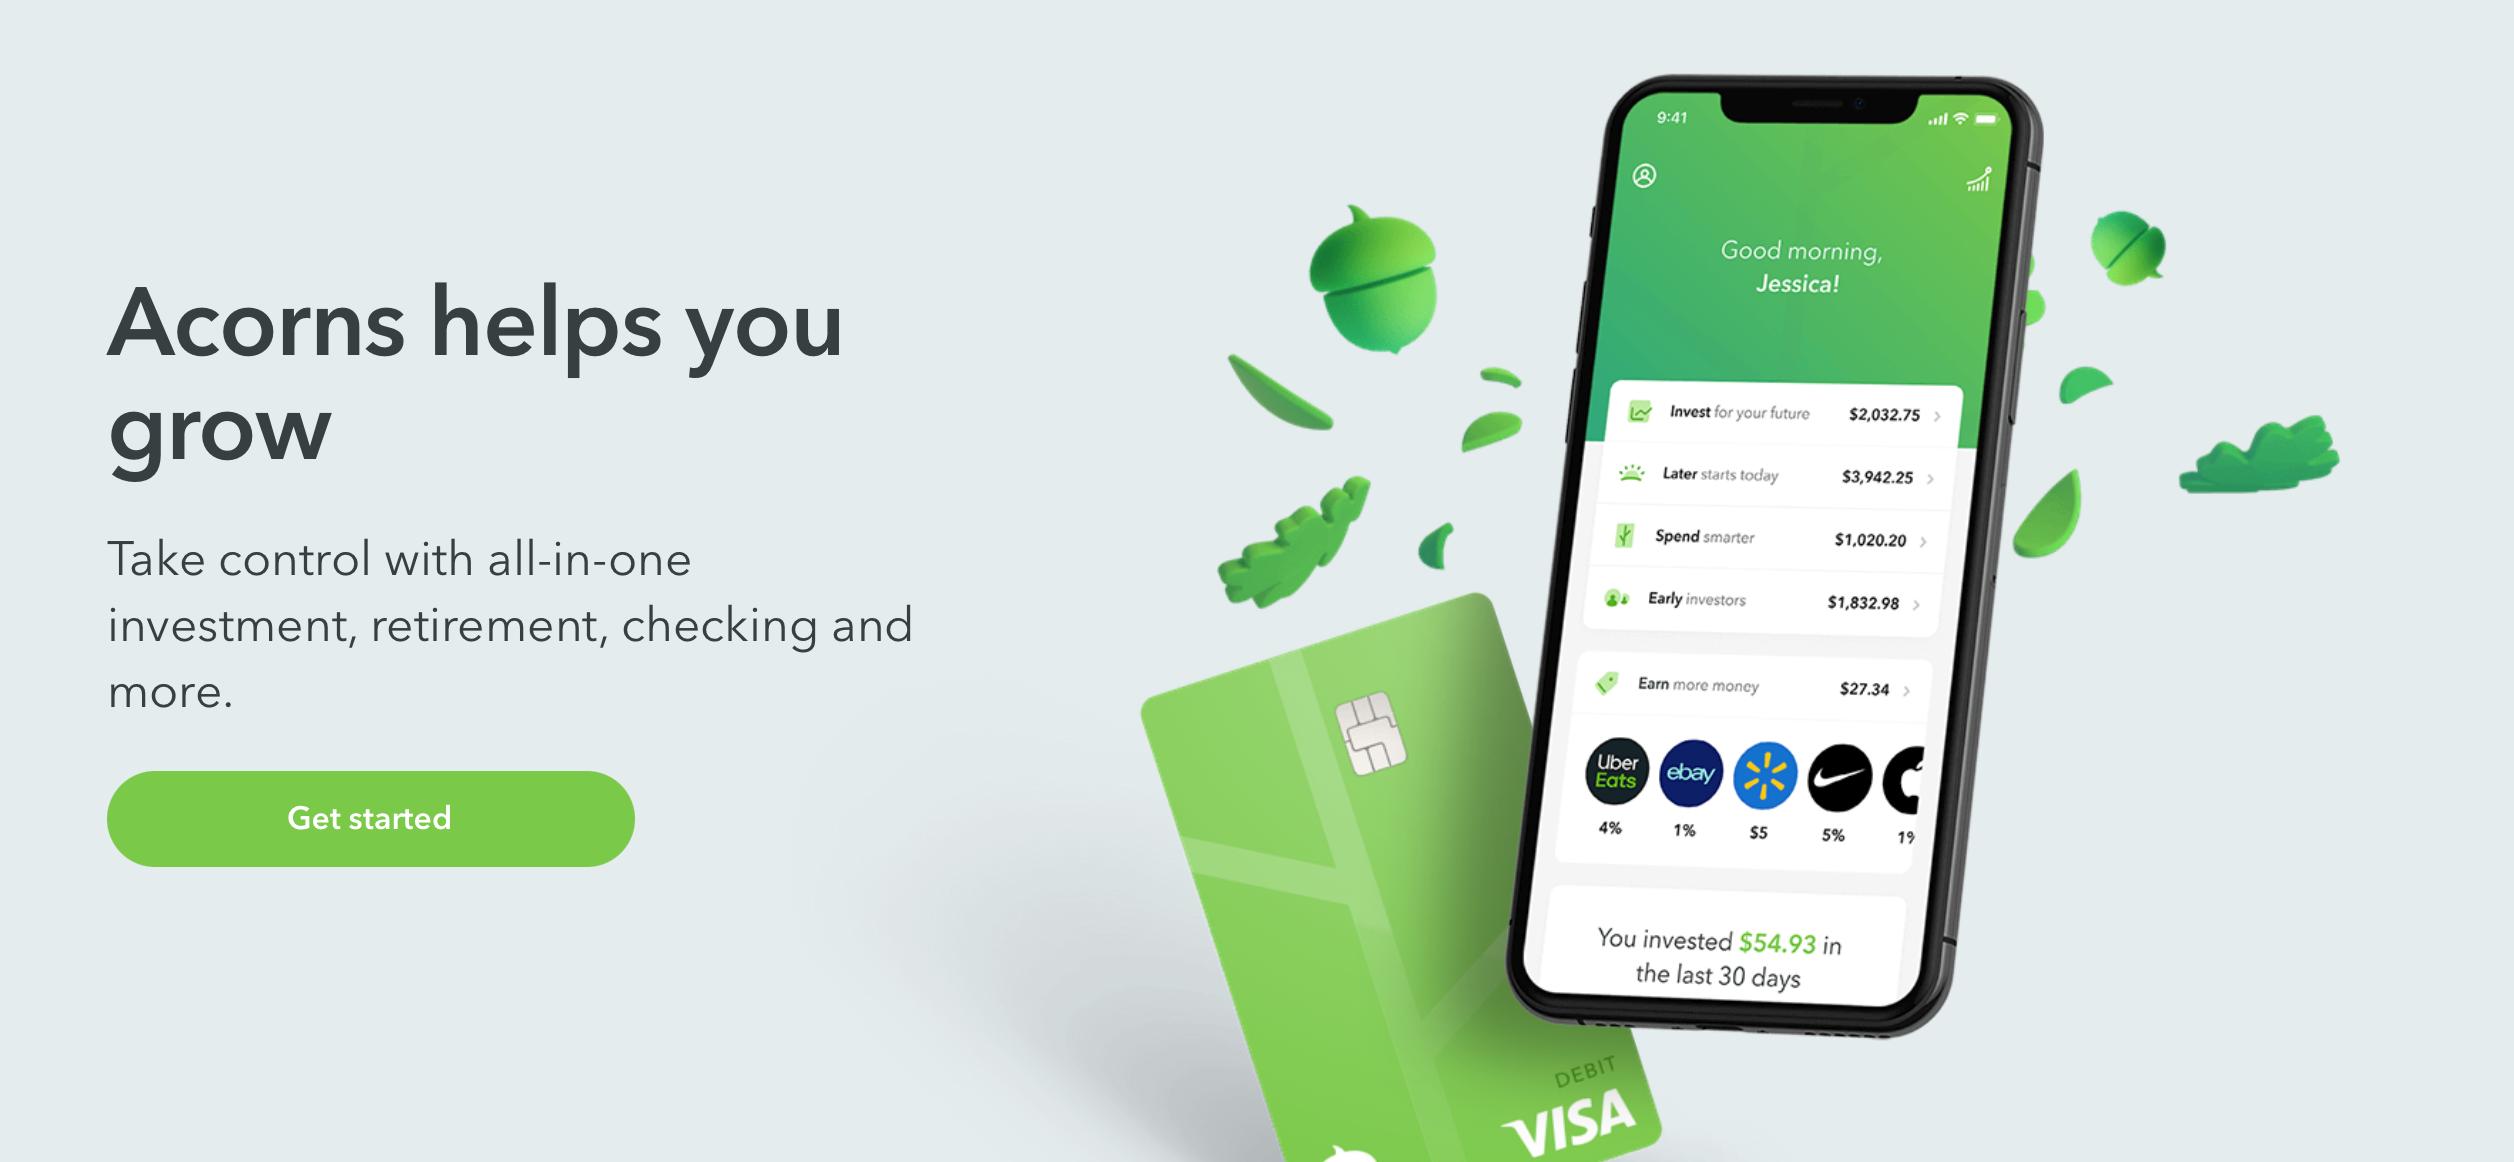 Acorns personal finance app